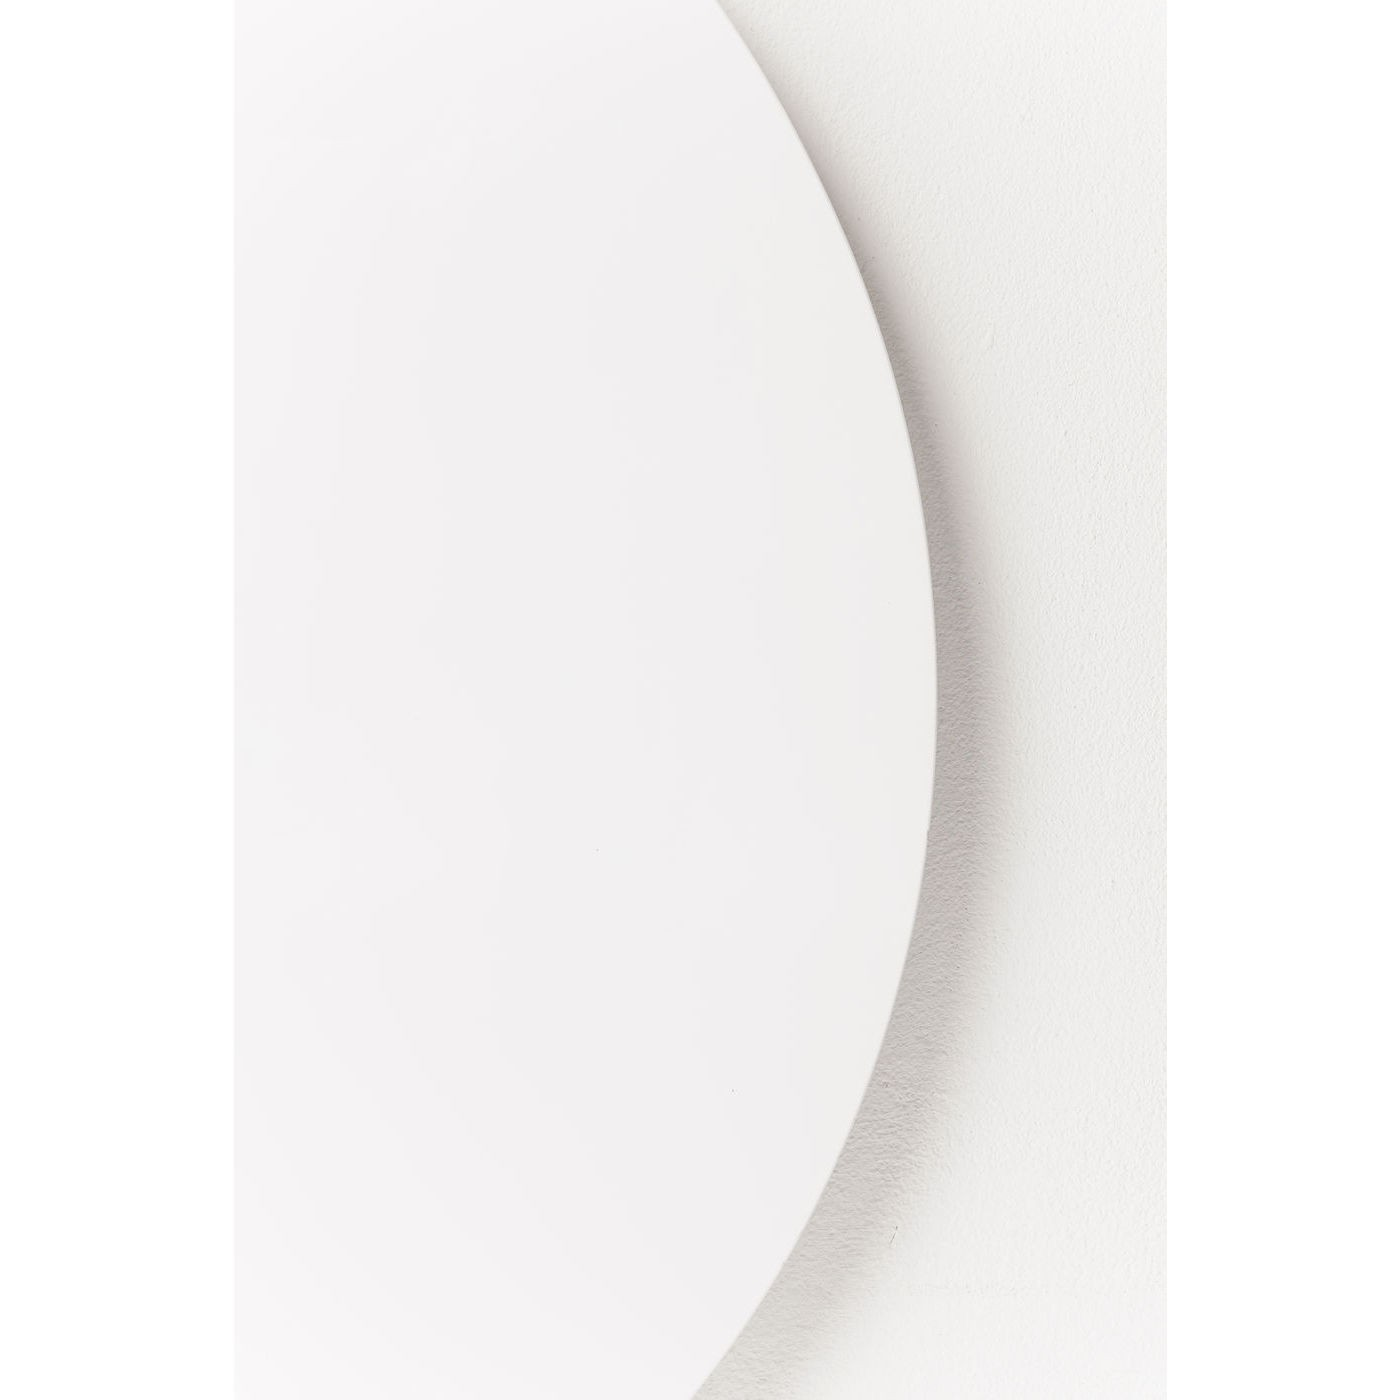 Plateau de table Invitation rond blanc Kare Design Diamètre - 90cm